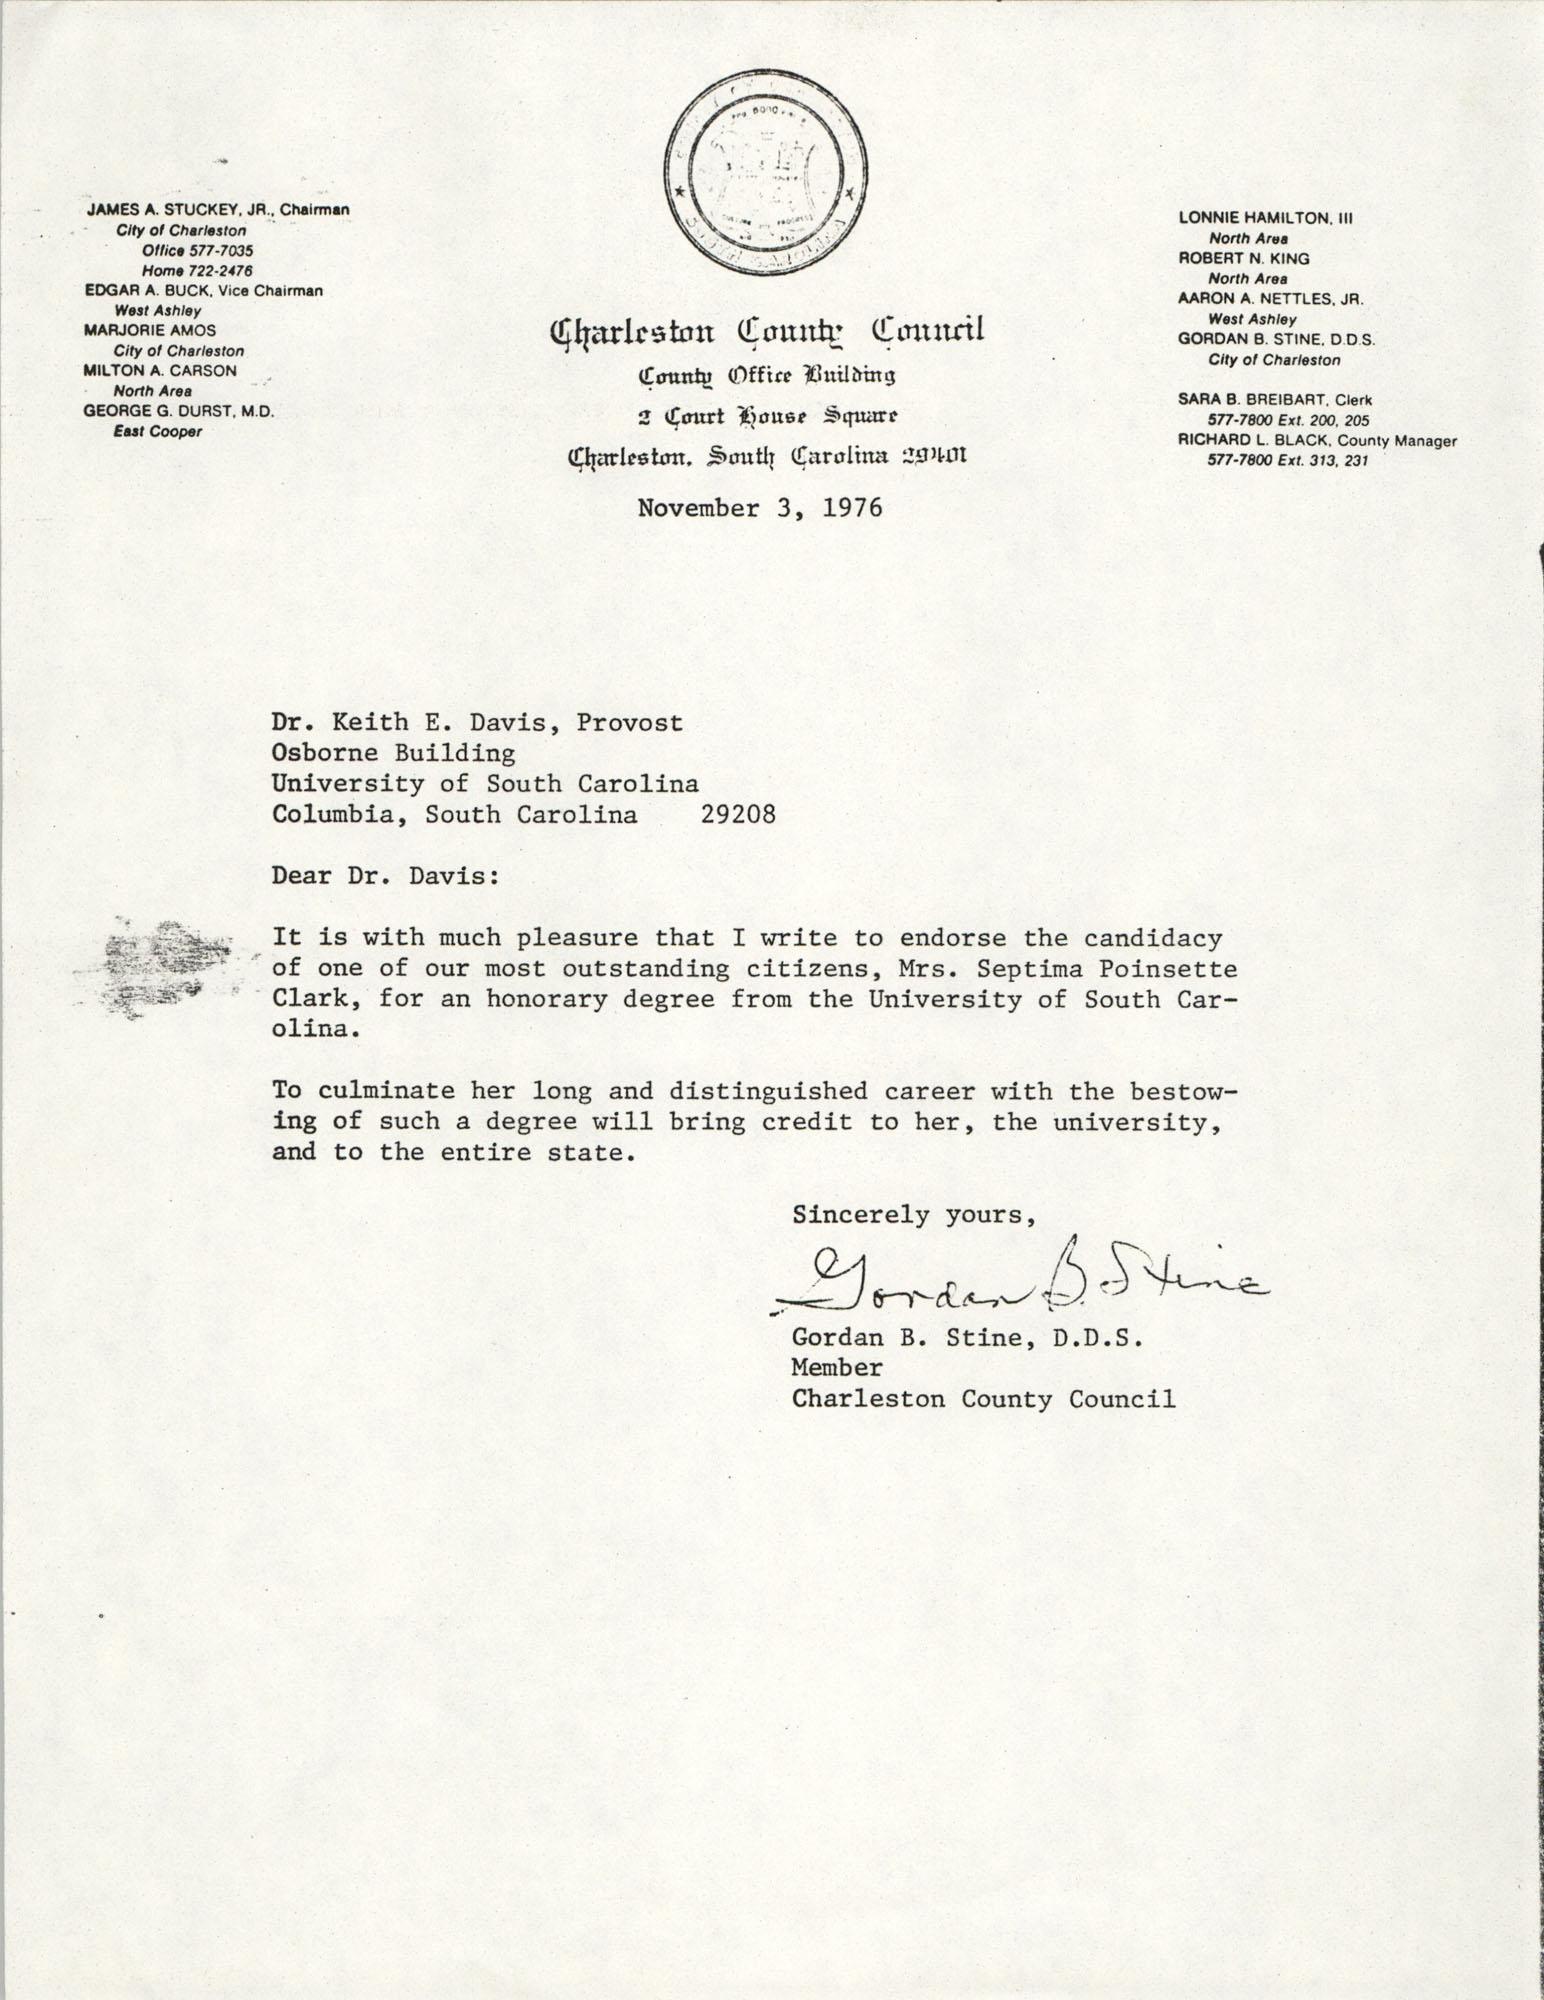 Letter from Gordon B. Stine to Keith E. Davis, November 3, 1976